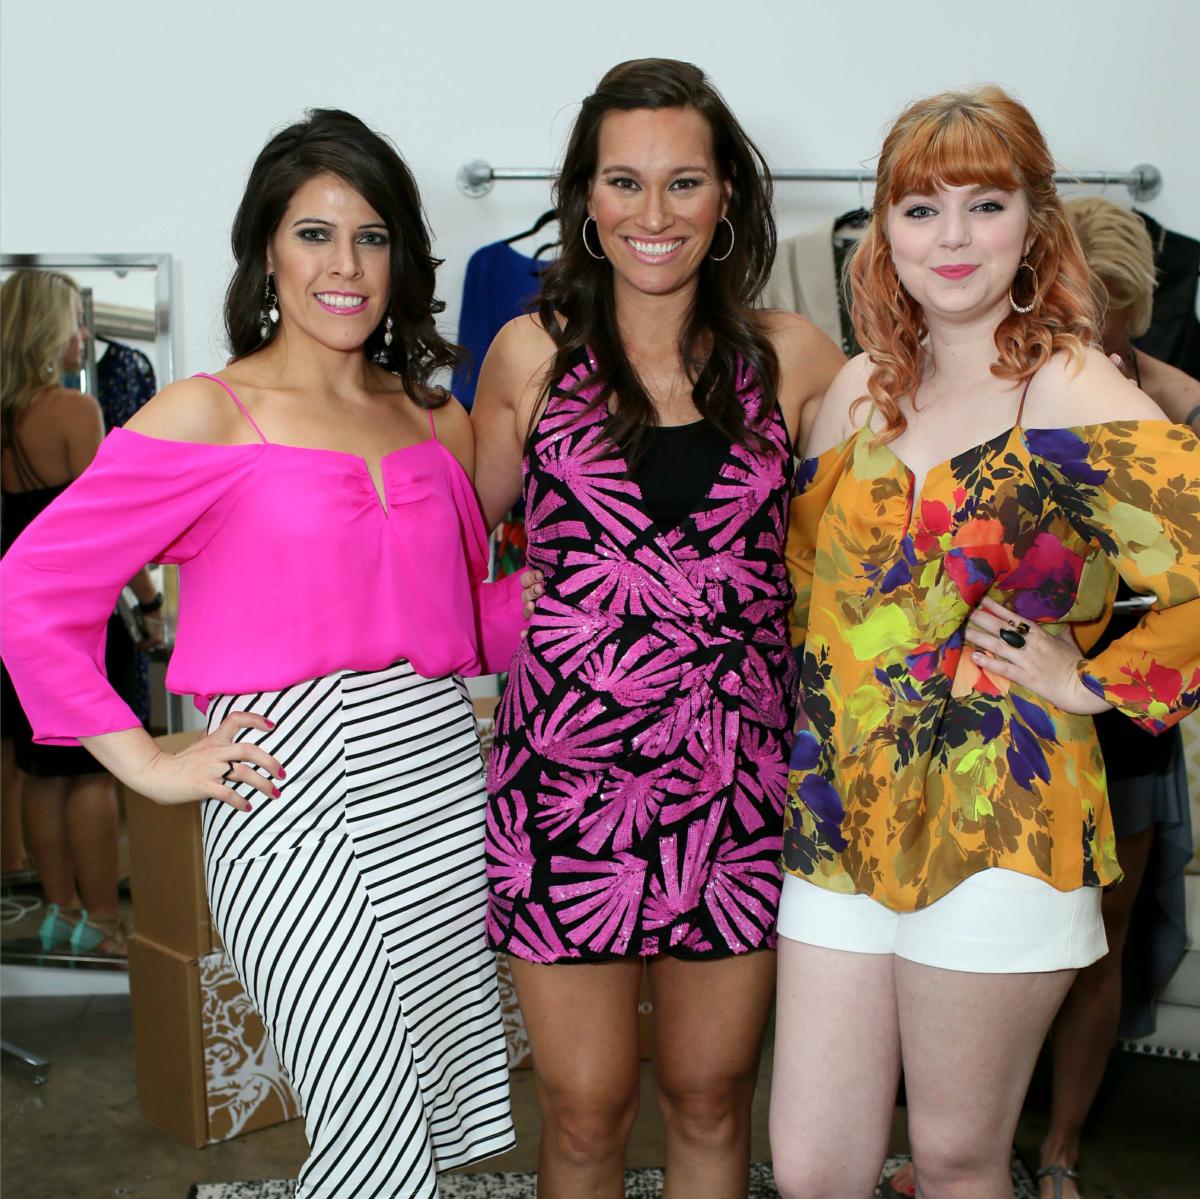 Amy Espinosa, Nina Lowe, Rachel Davis, fdf 2 year anniversary